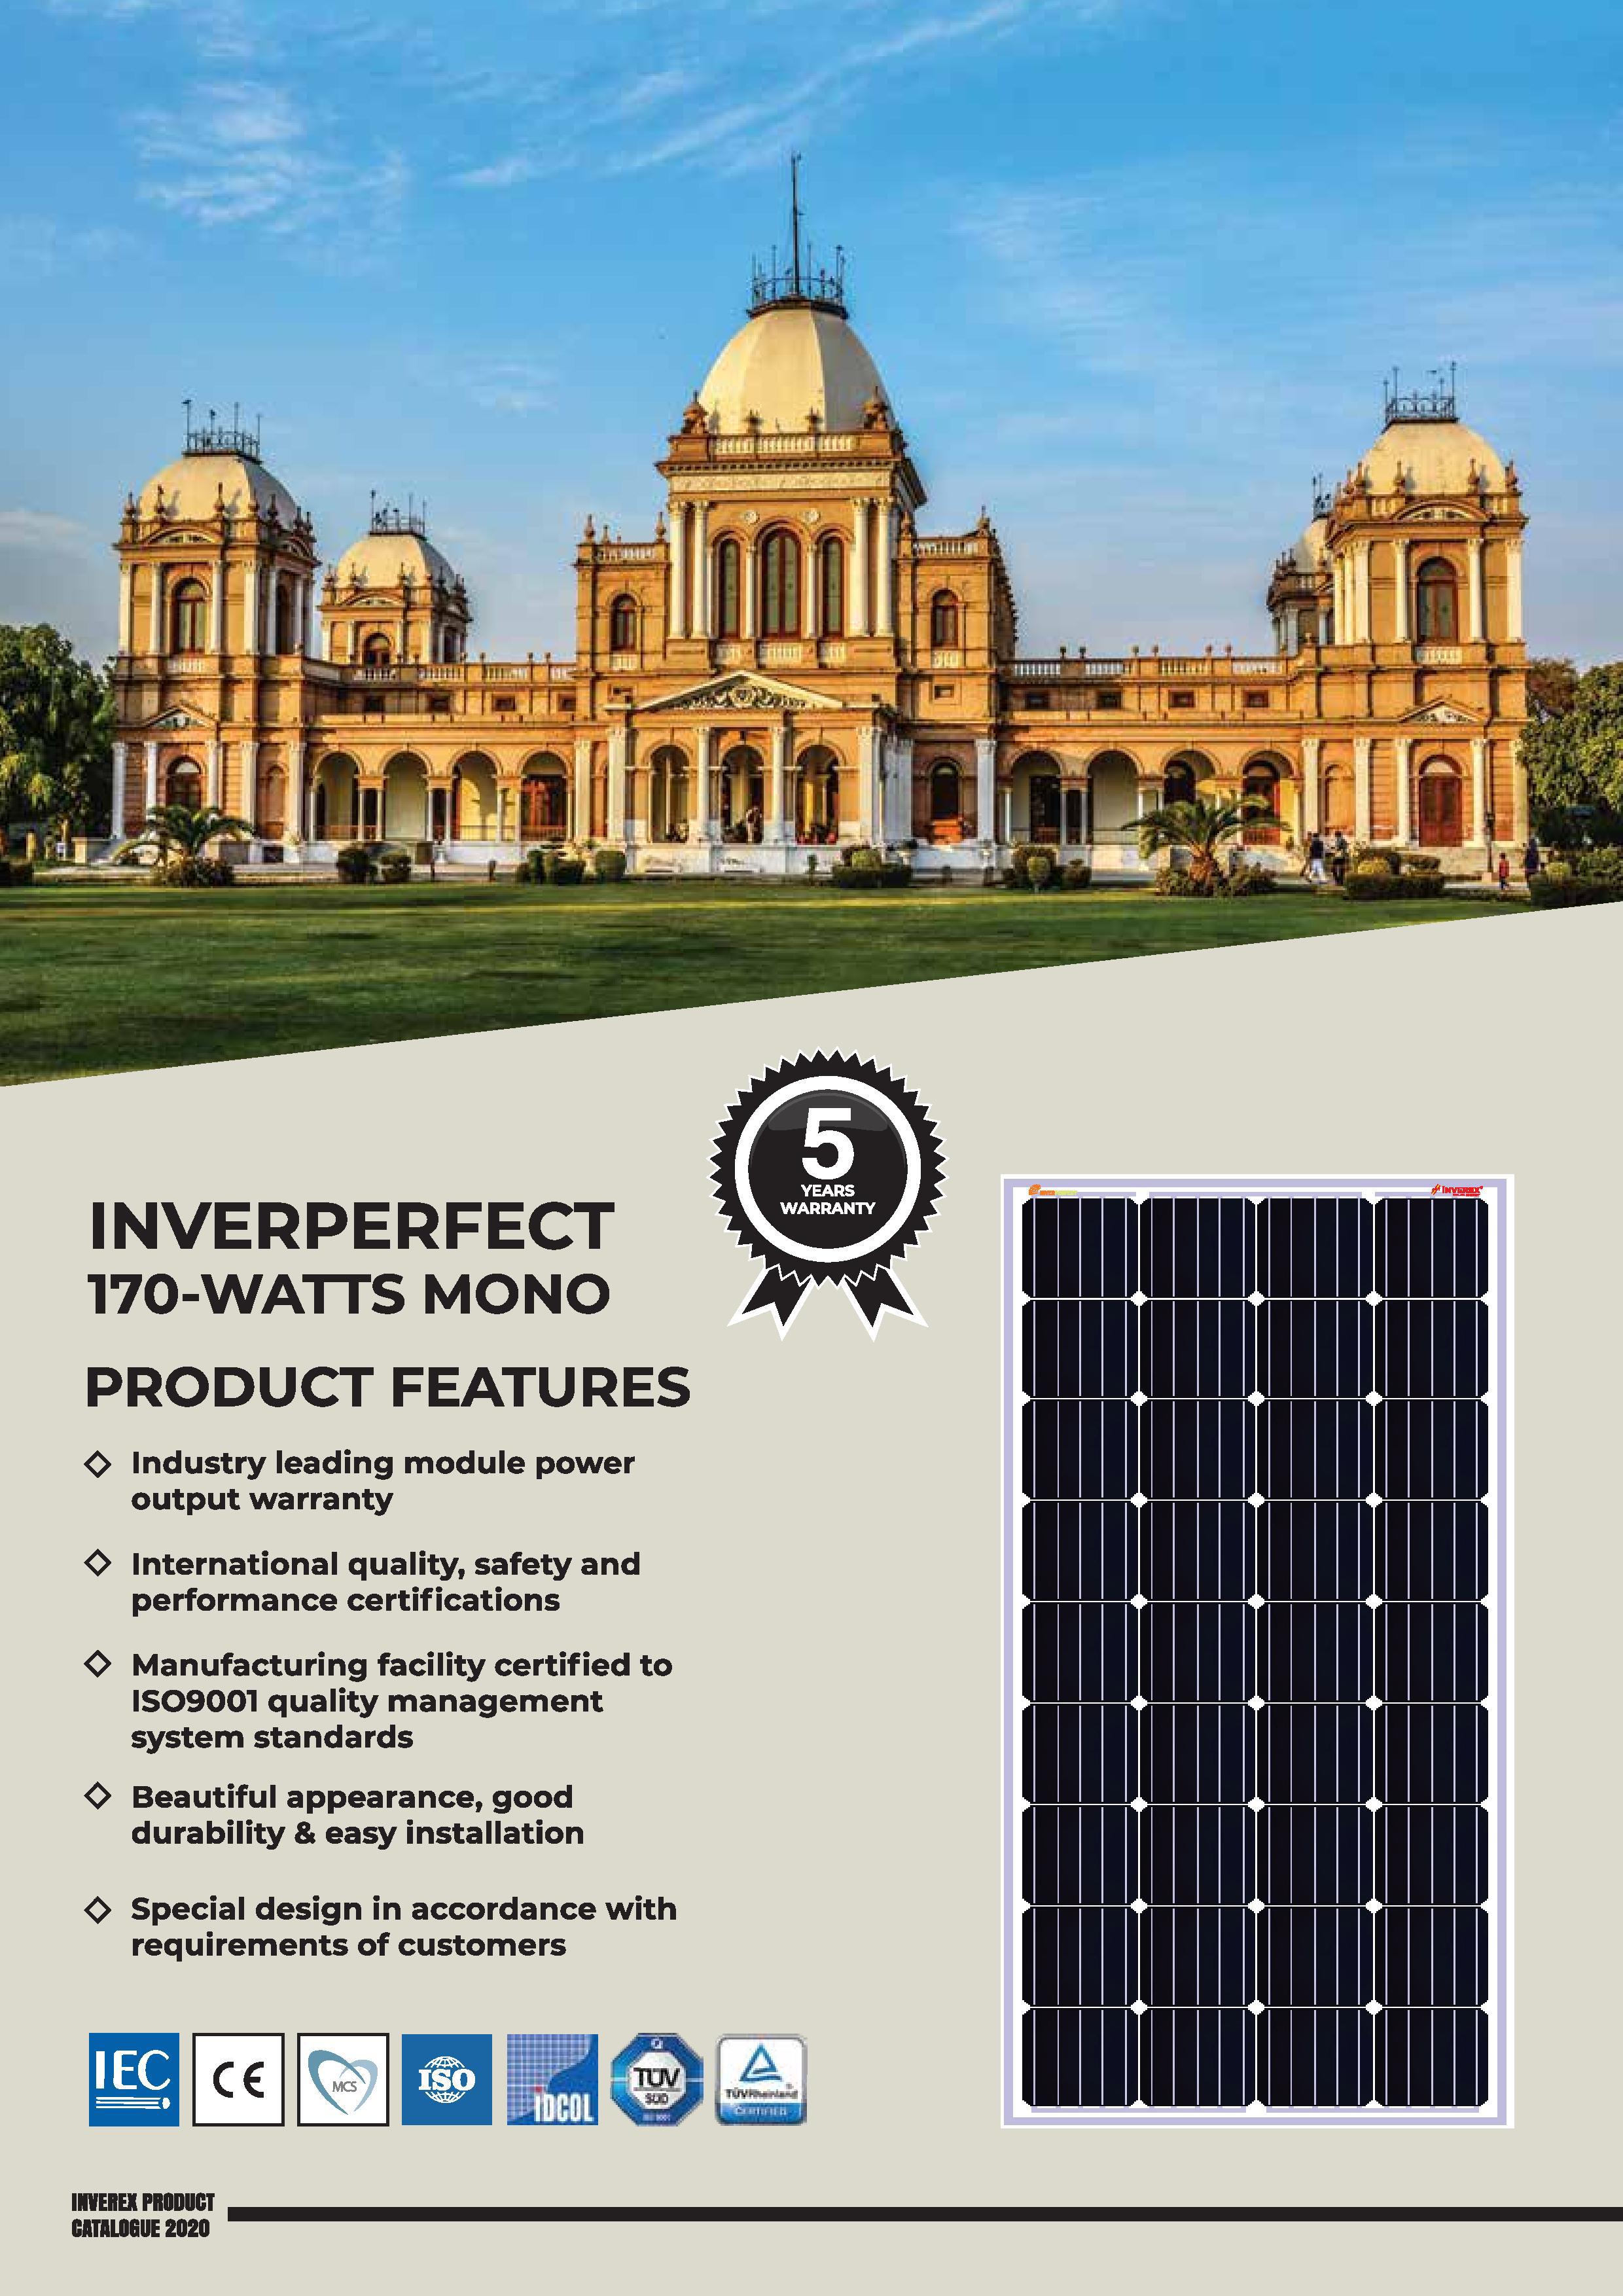 INVERPERFECT-170-WATT-MONO-details2